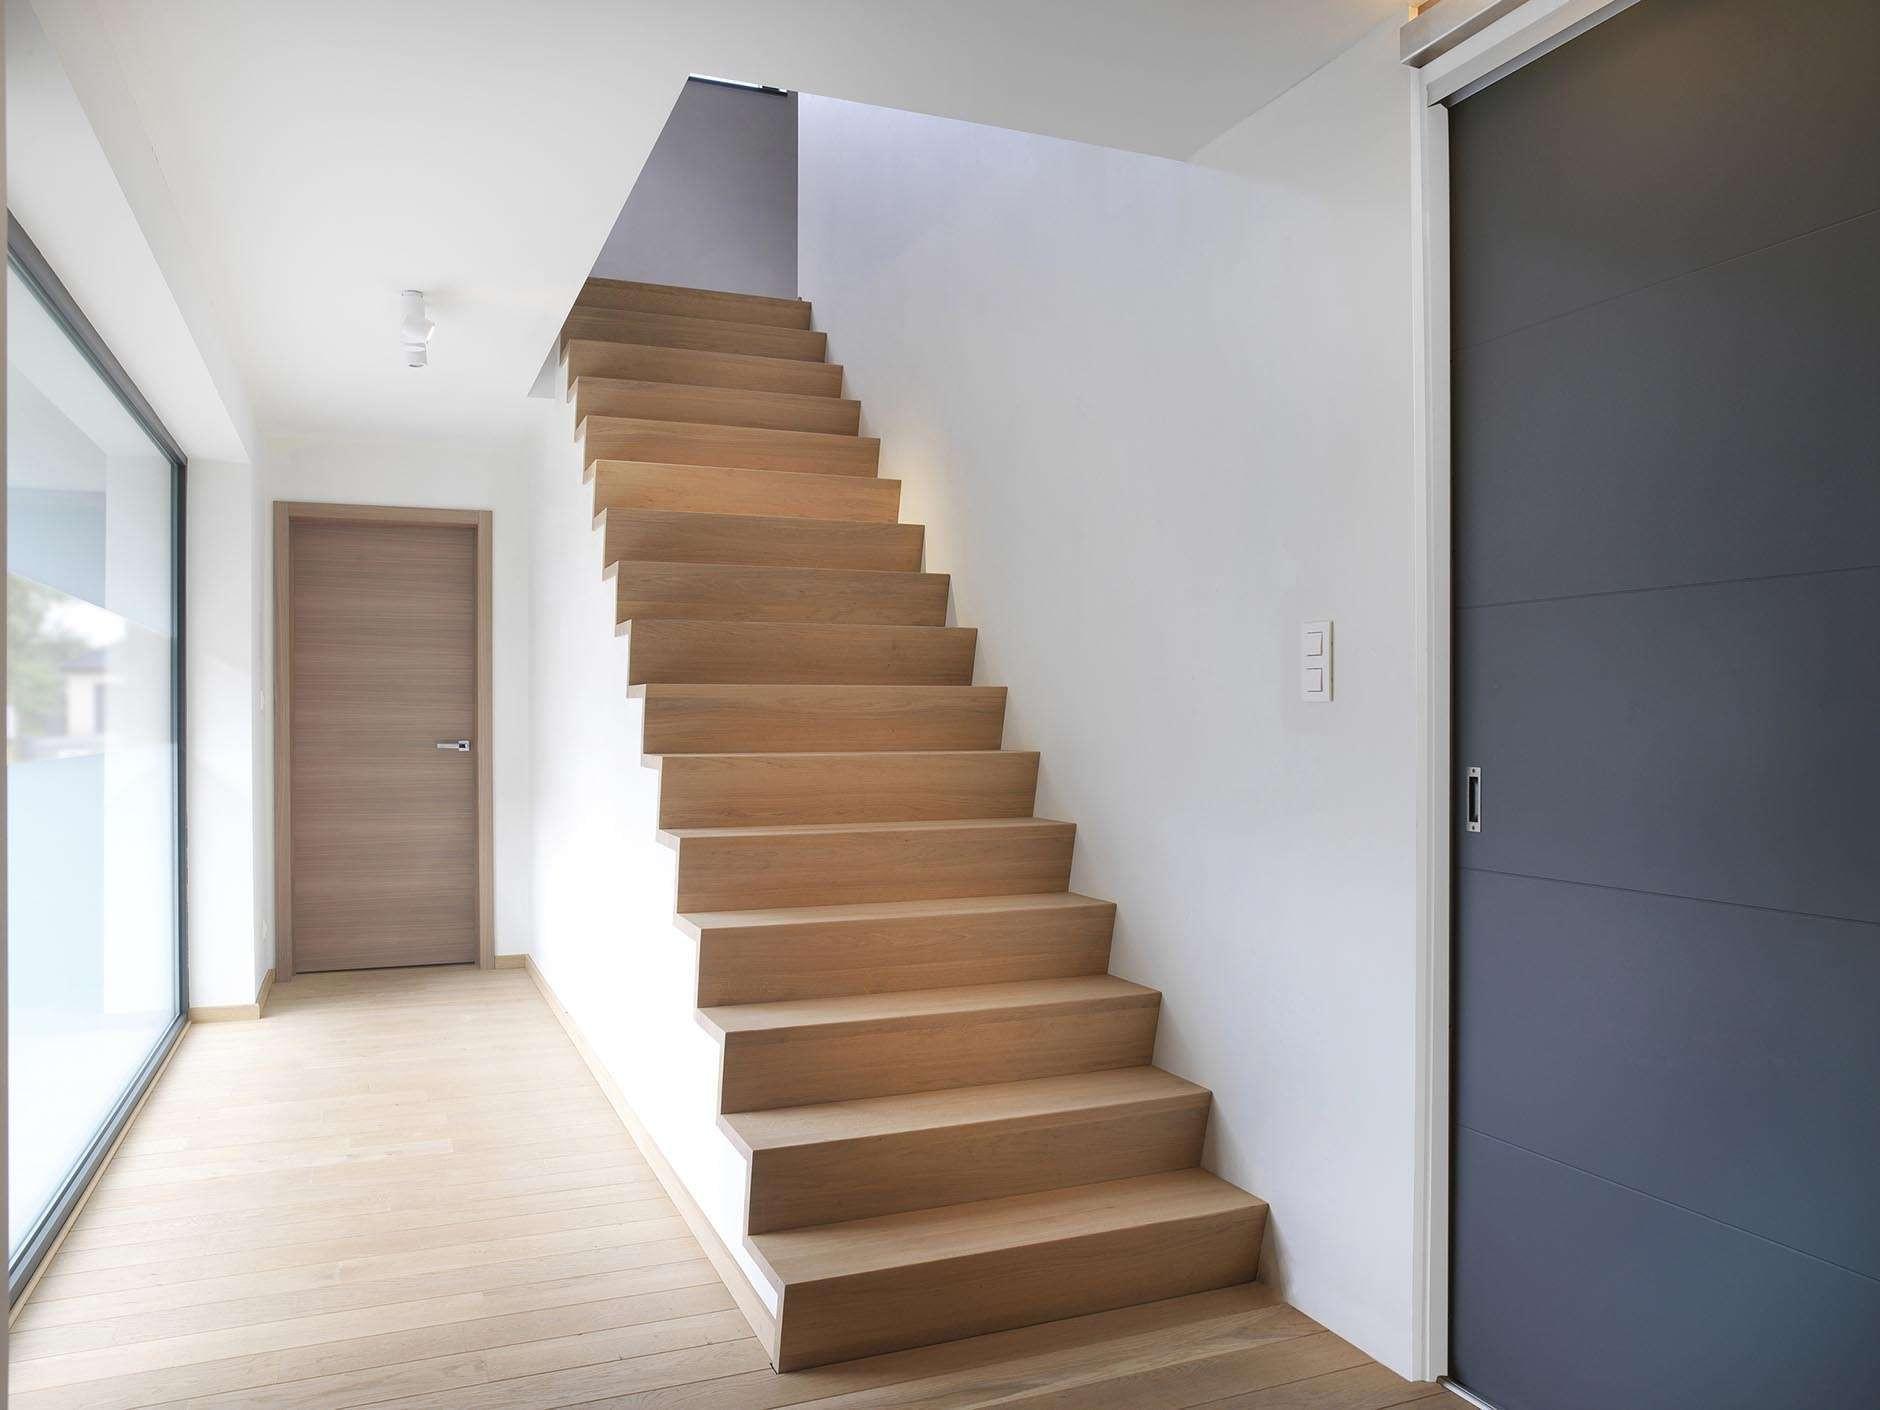 houten-trap-modern-hedendaags-interieur